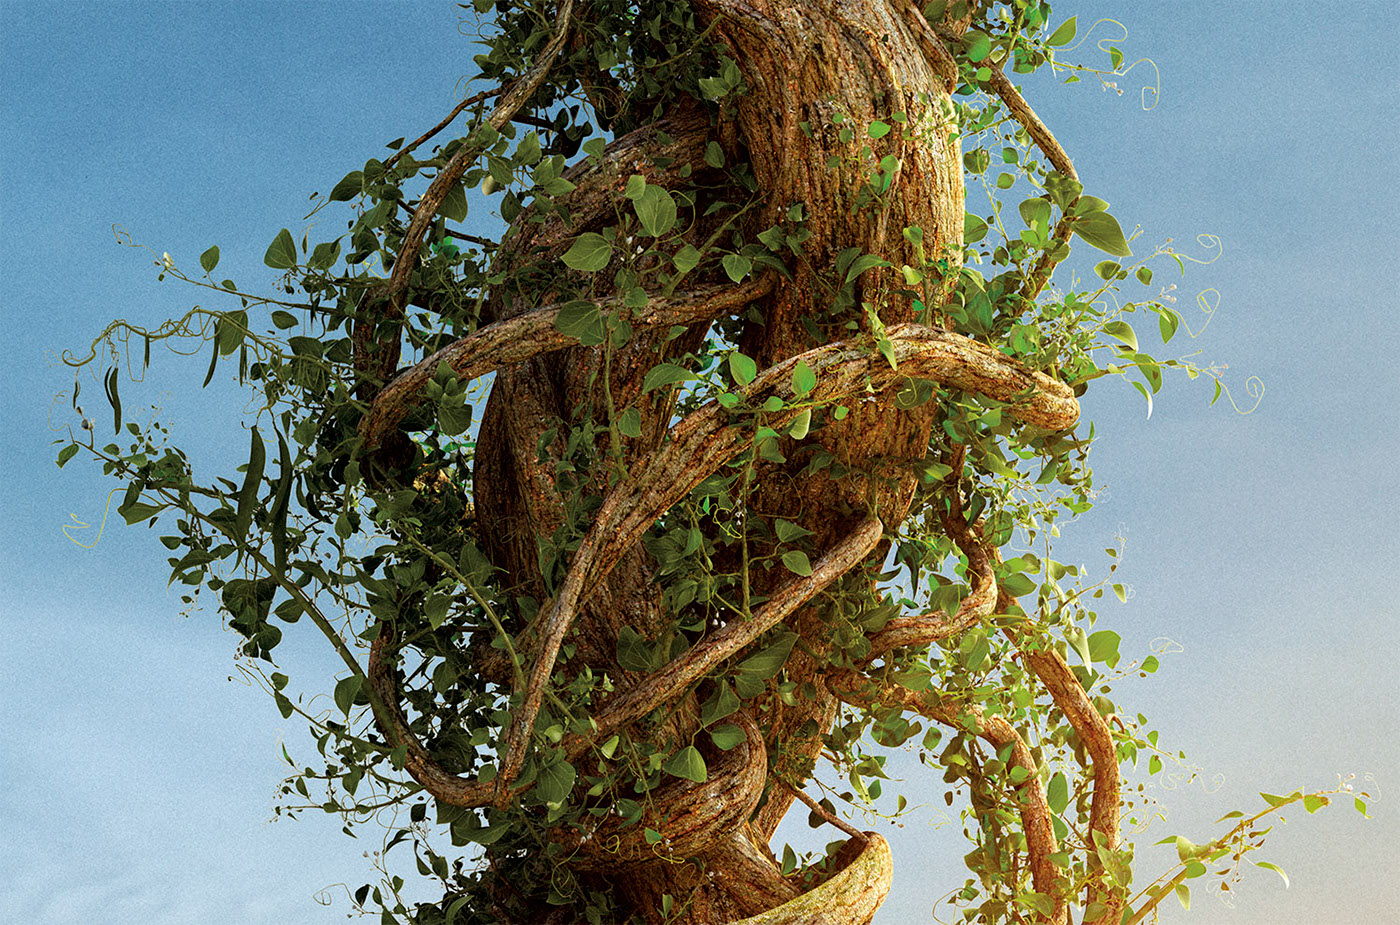 CGI vfx 3D Landscape plants Tree  sunset summer fantasy fairytale SKY foliage Nature natural sci-fi